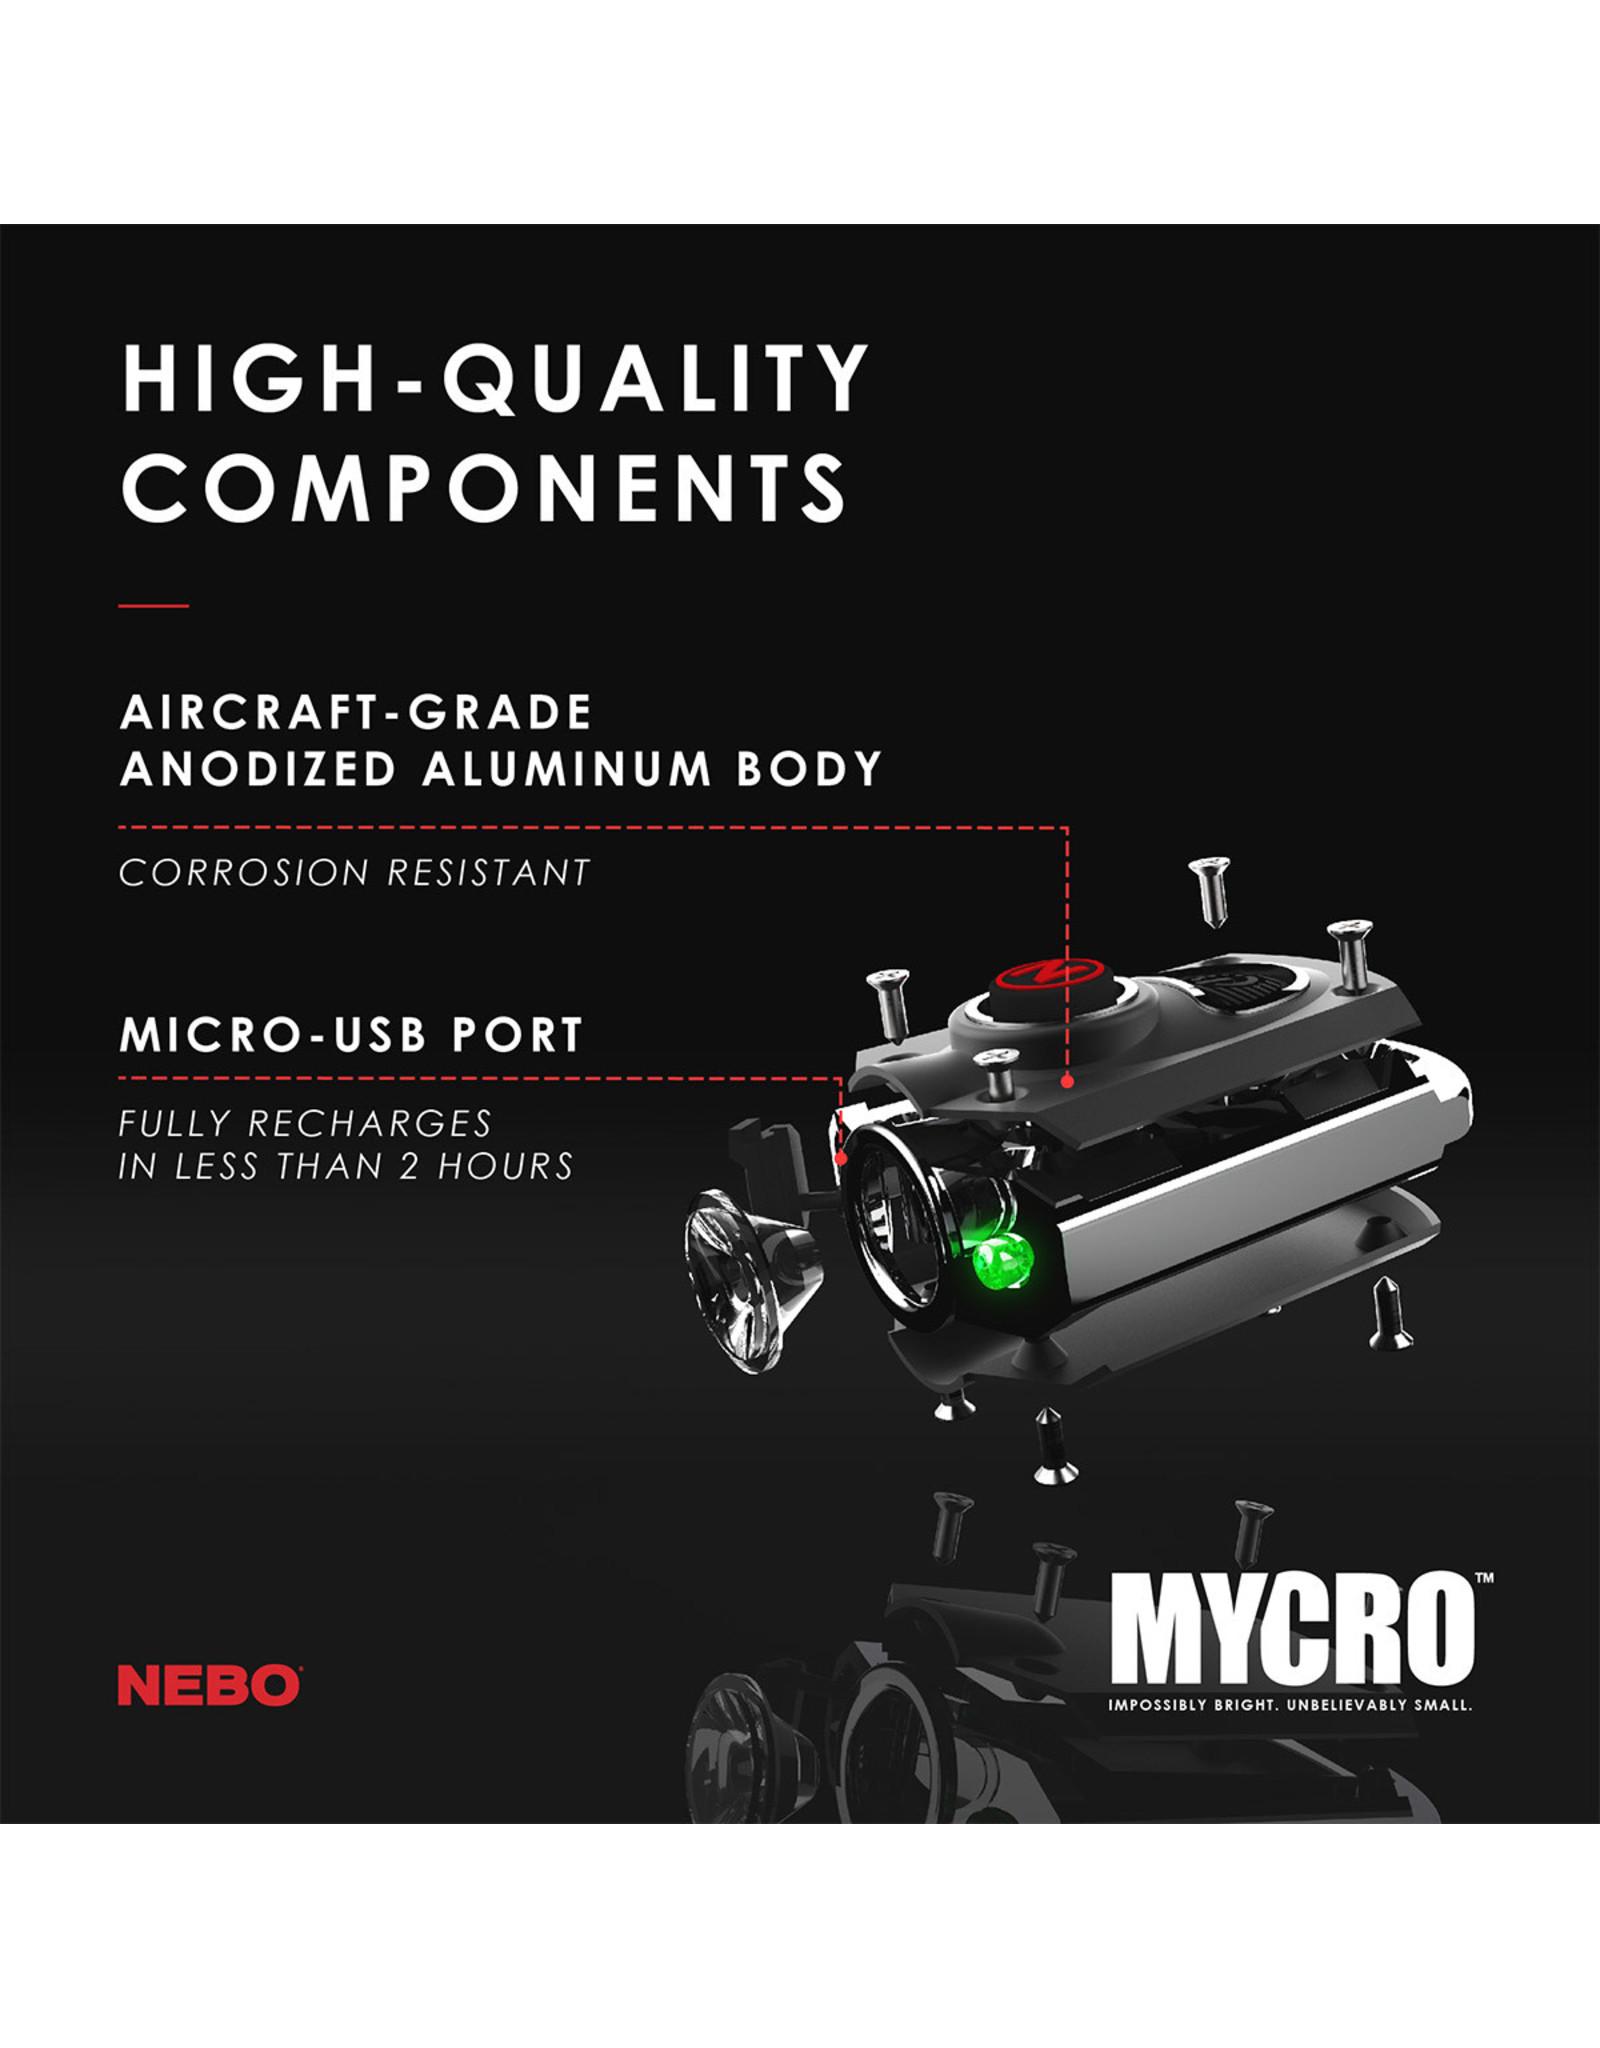 Mycro Pocket Light 400 Lumens 6 Modes 3 Color